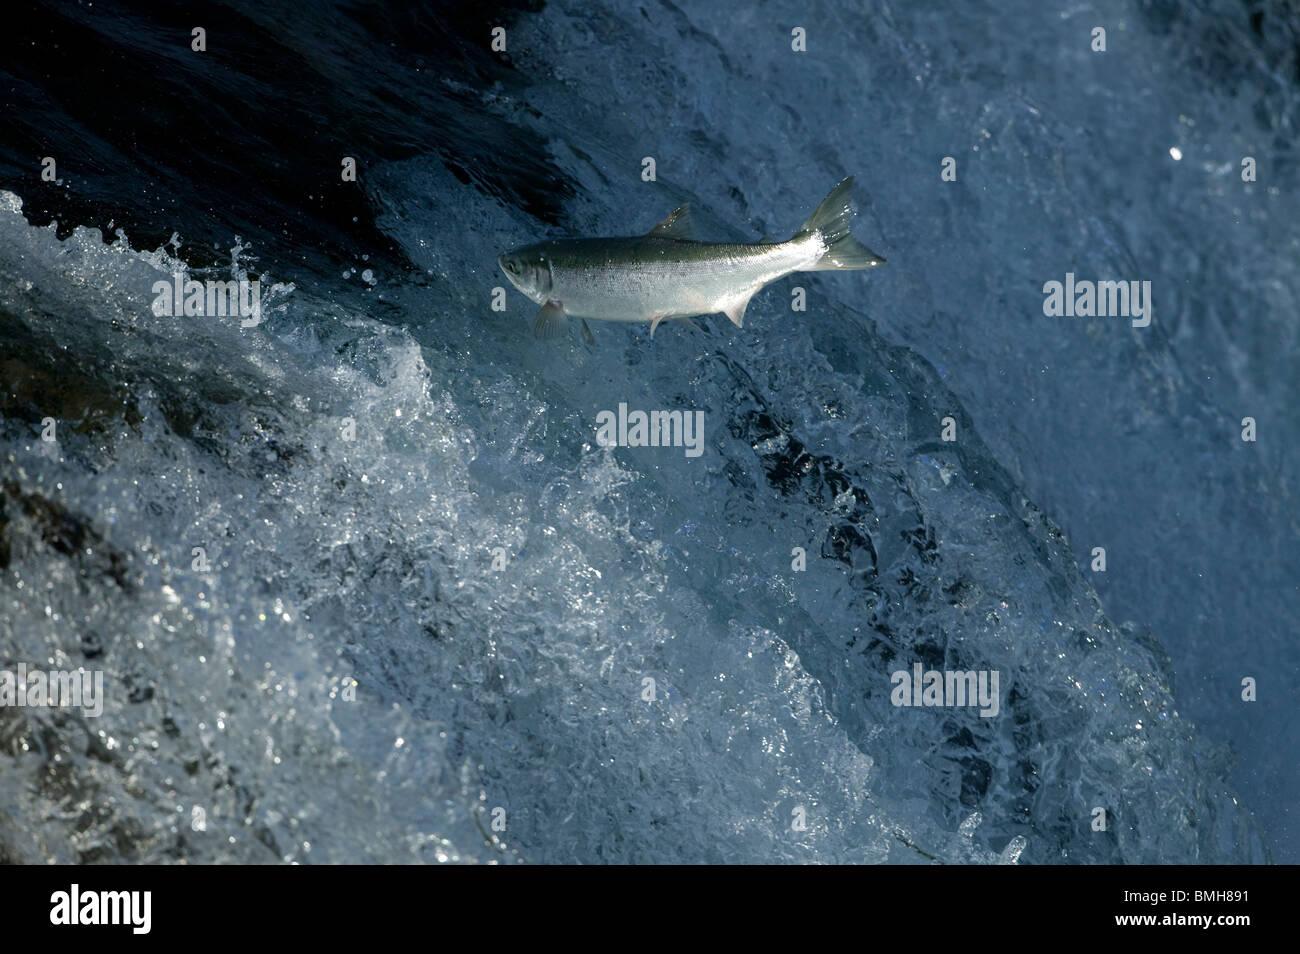 Sockeye salmon swimming upstream, Brooks Falls, Katmai National Park, Alaska - Stock Image